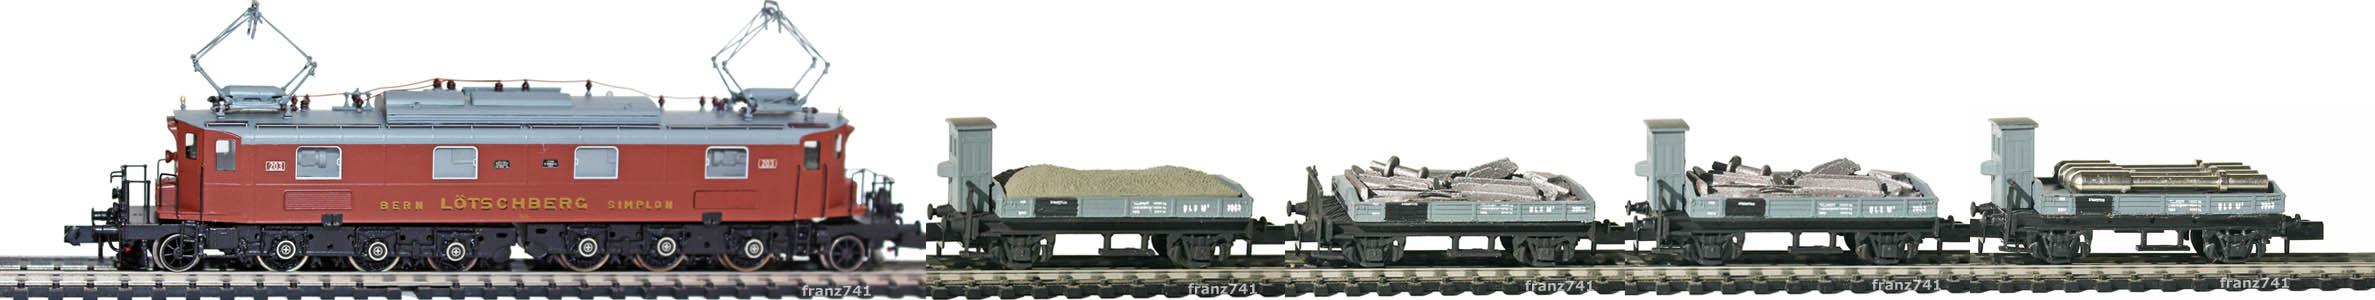 Epoche-II-BLS-Gueterzug_Be-6-8-Elok-Bremserhaus-Gueterwagen